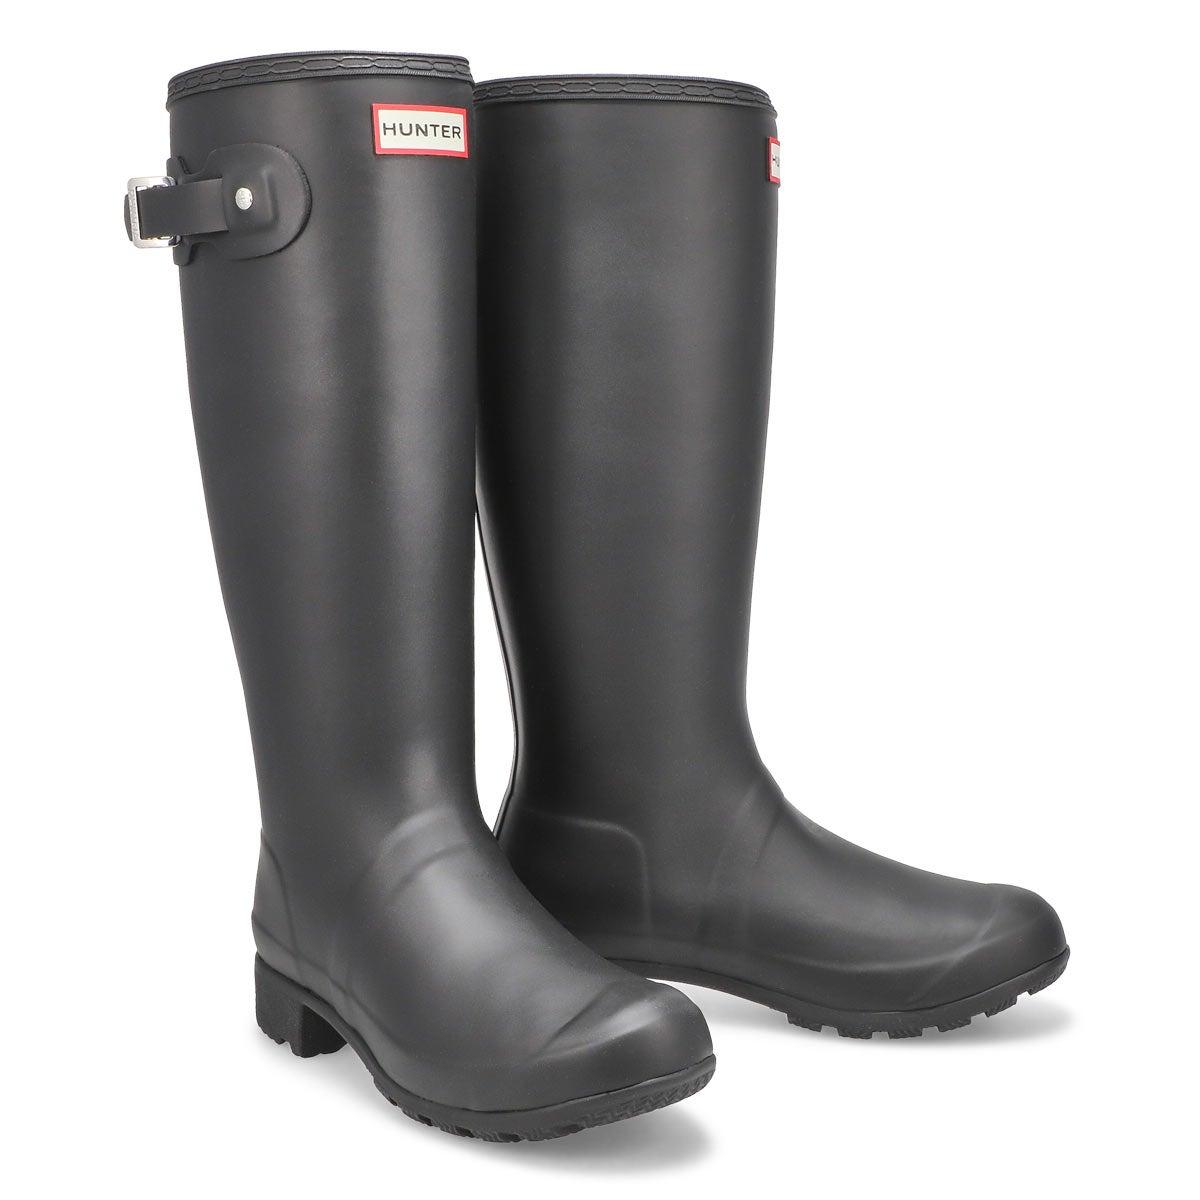 Lds Original Tour Classic blk rain boot